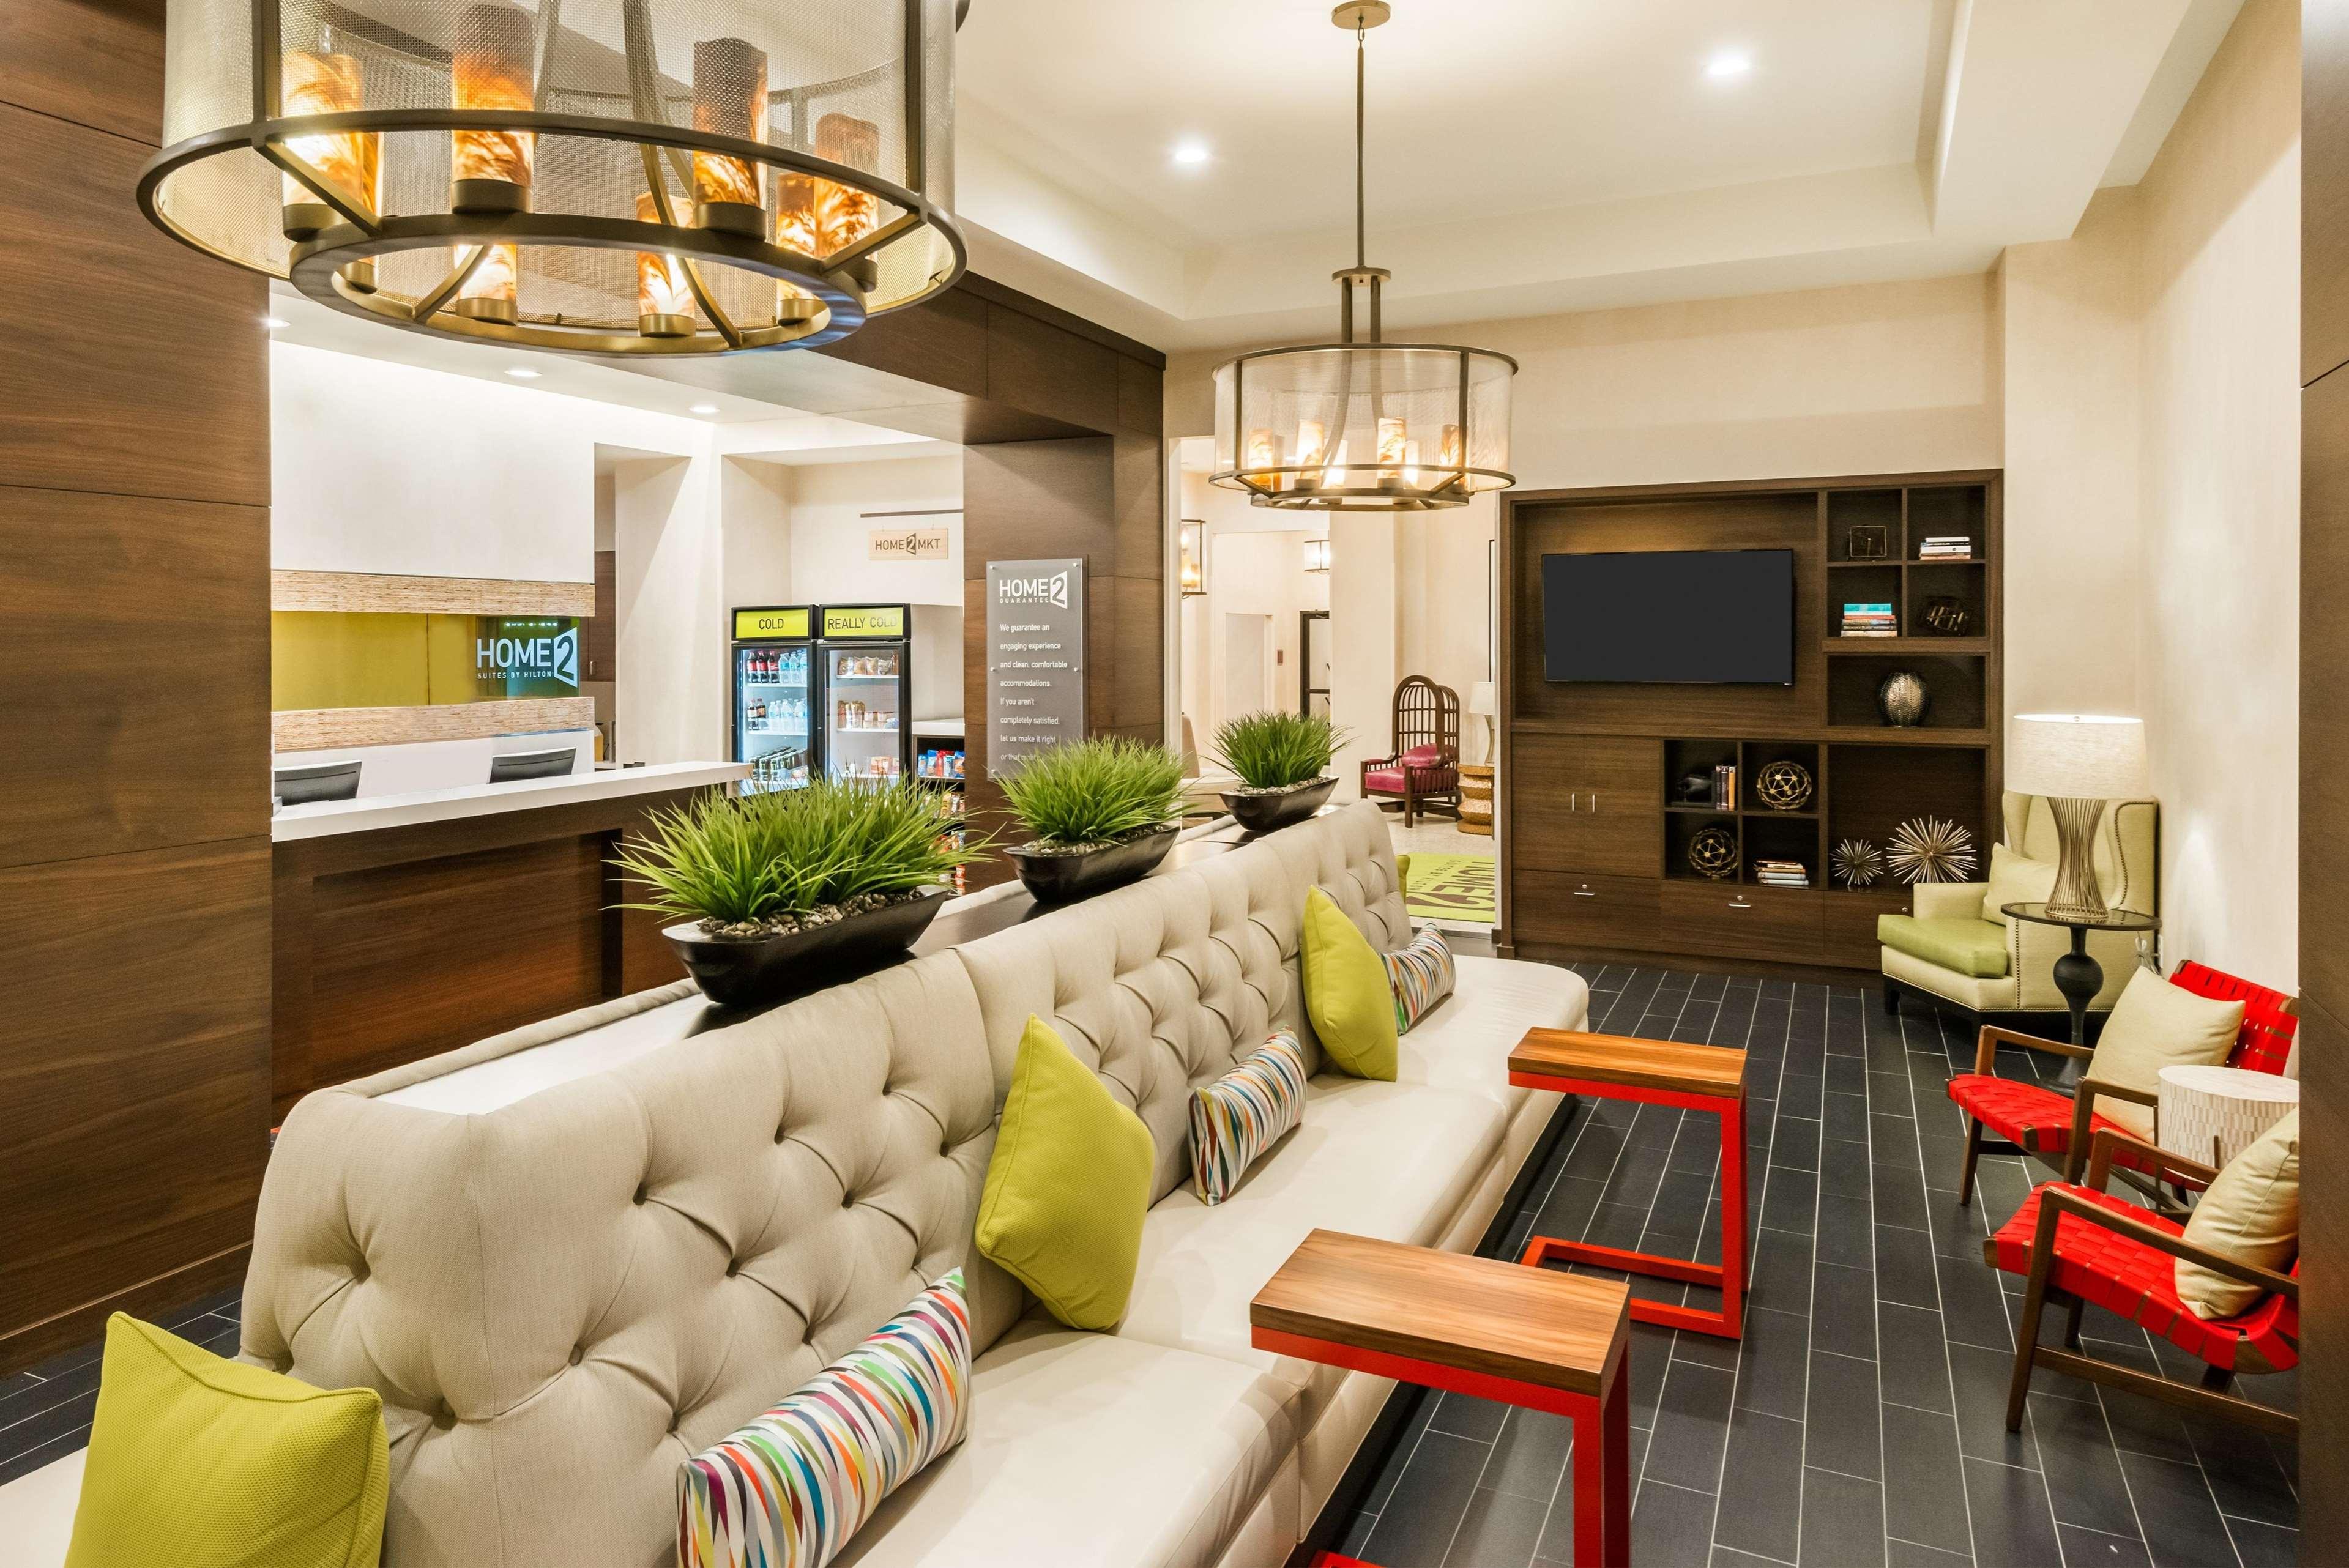 Home2 Suites by Hilton Atlanta Downtown image 11